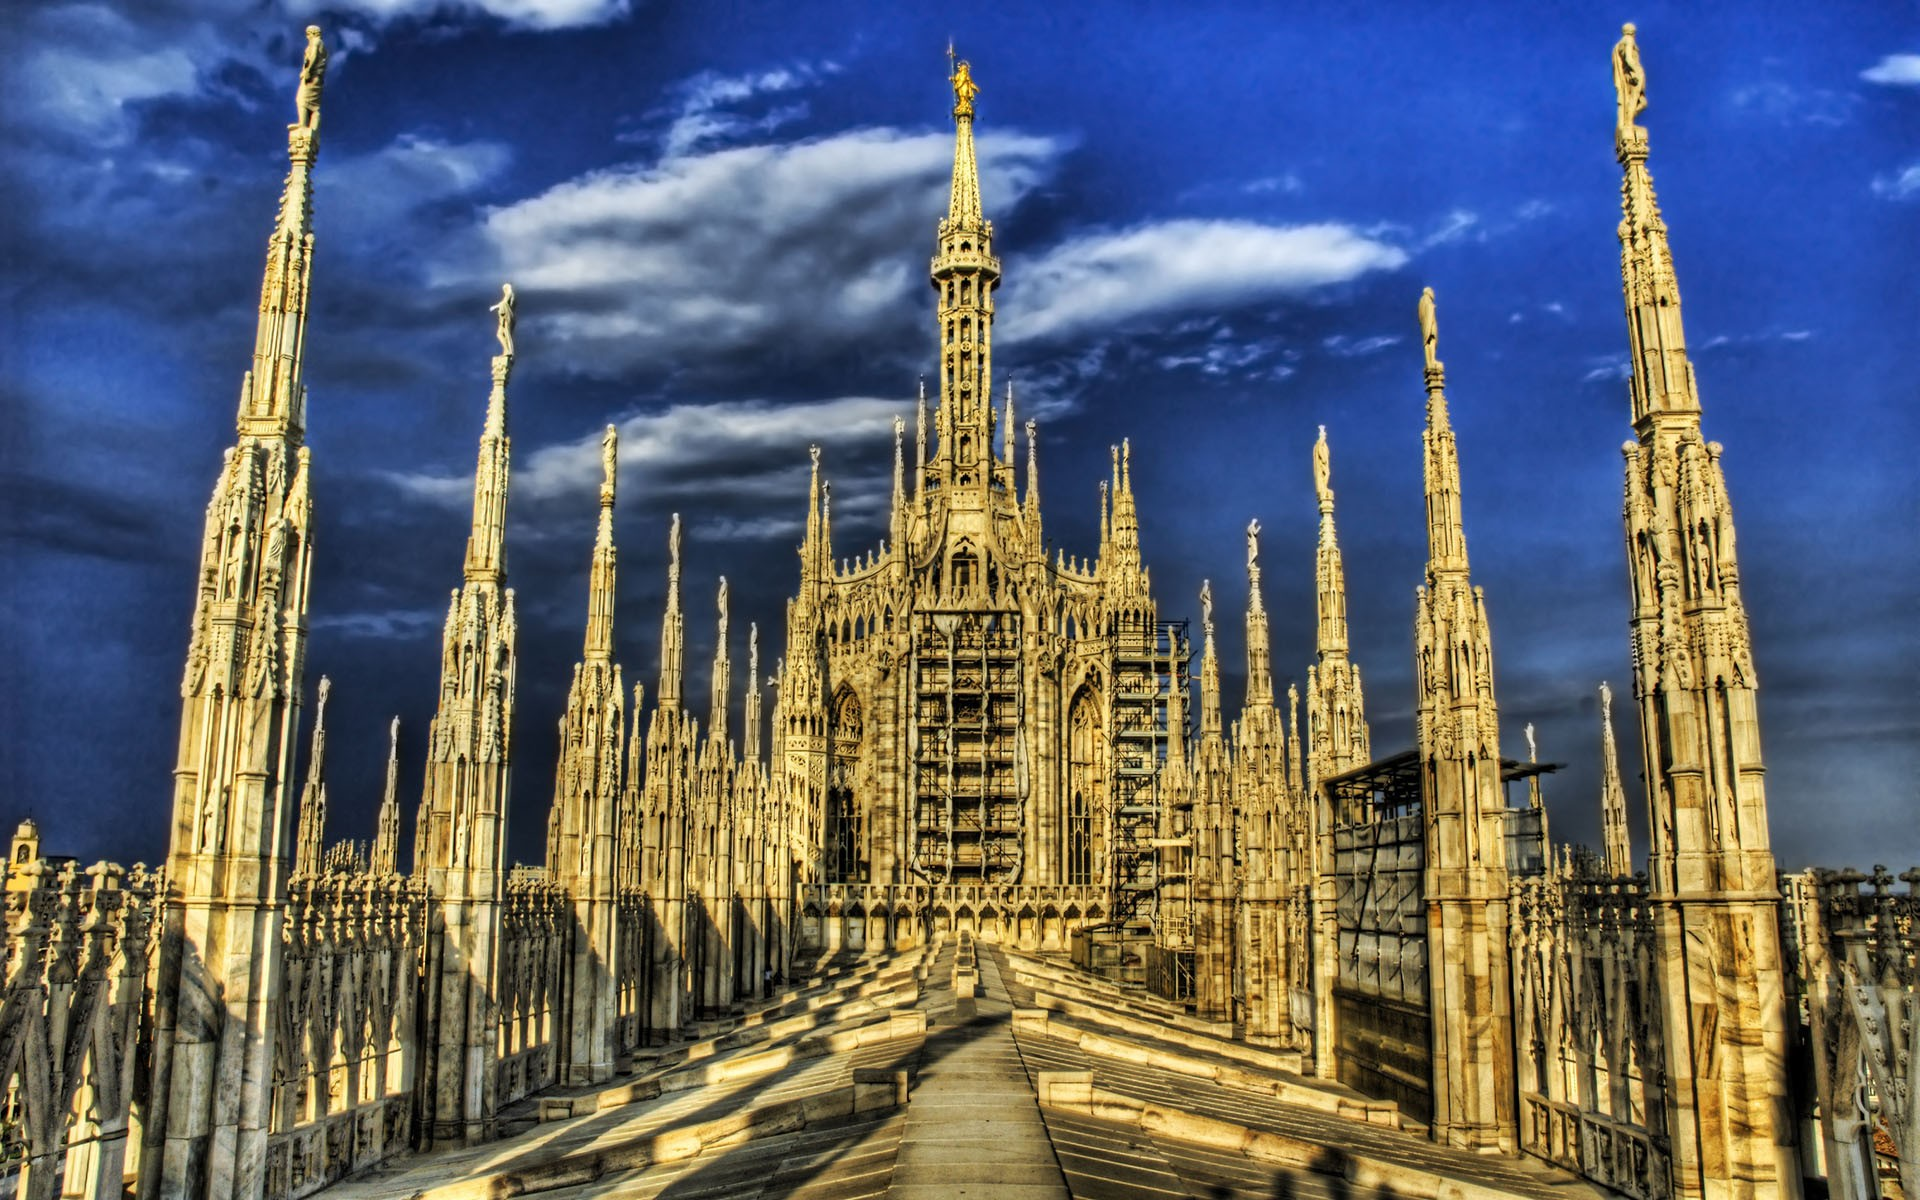 Очень красивые картинки архитектуры